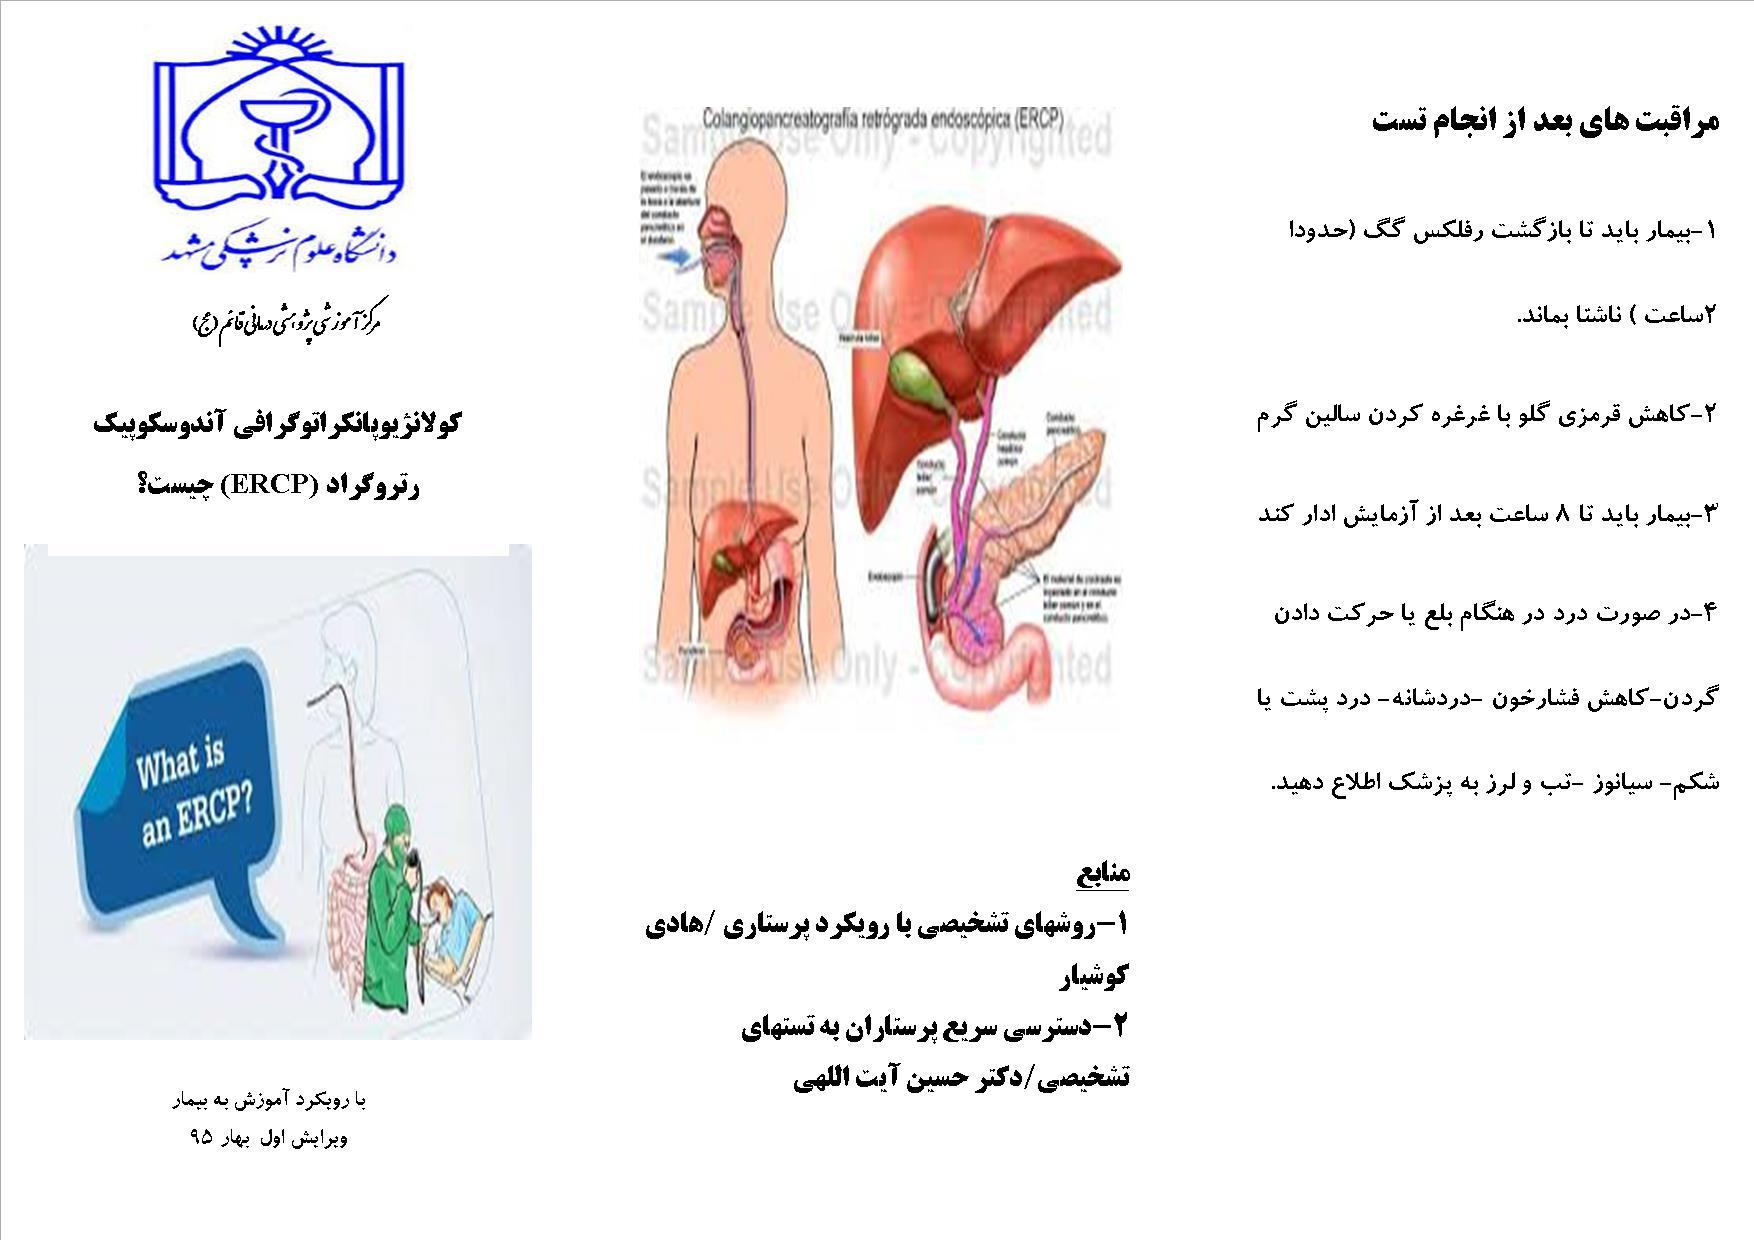 کولانژیوپانکرانوگرافی یا ERCP